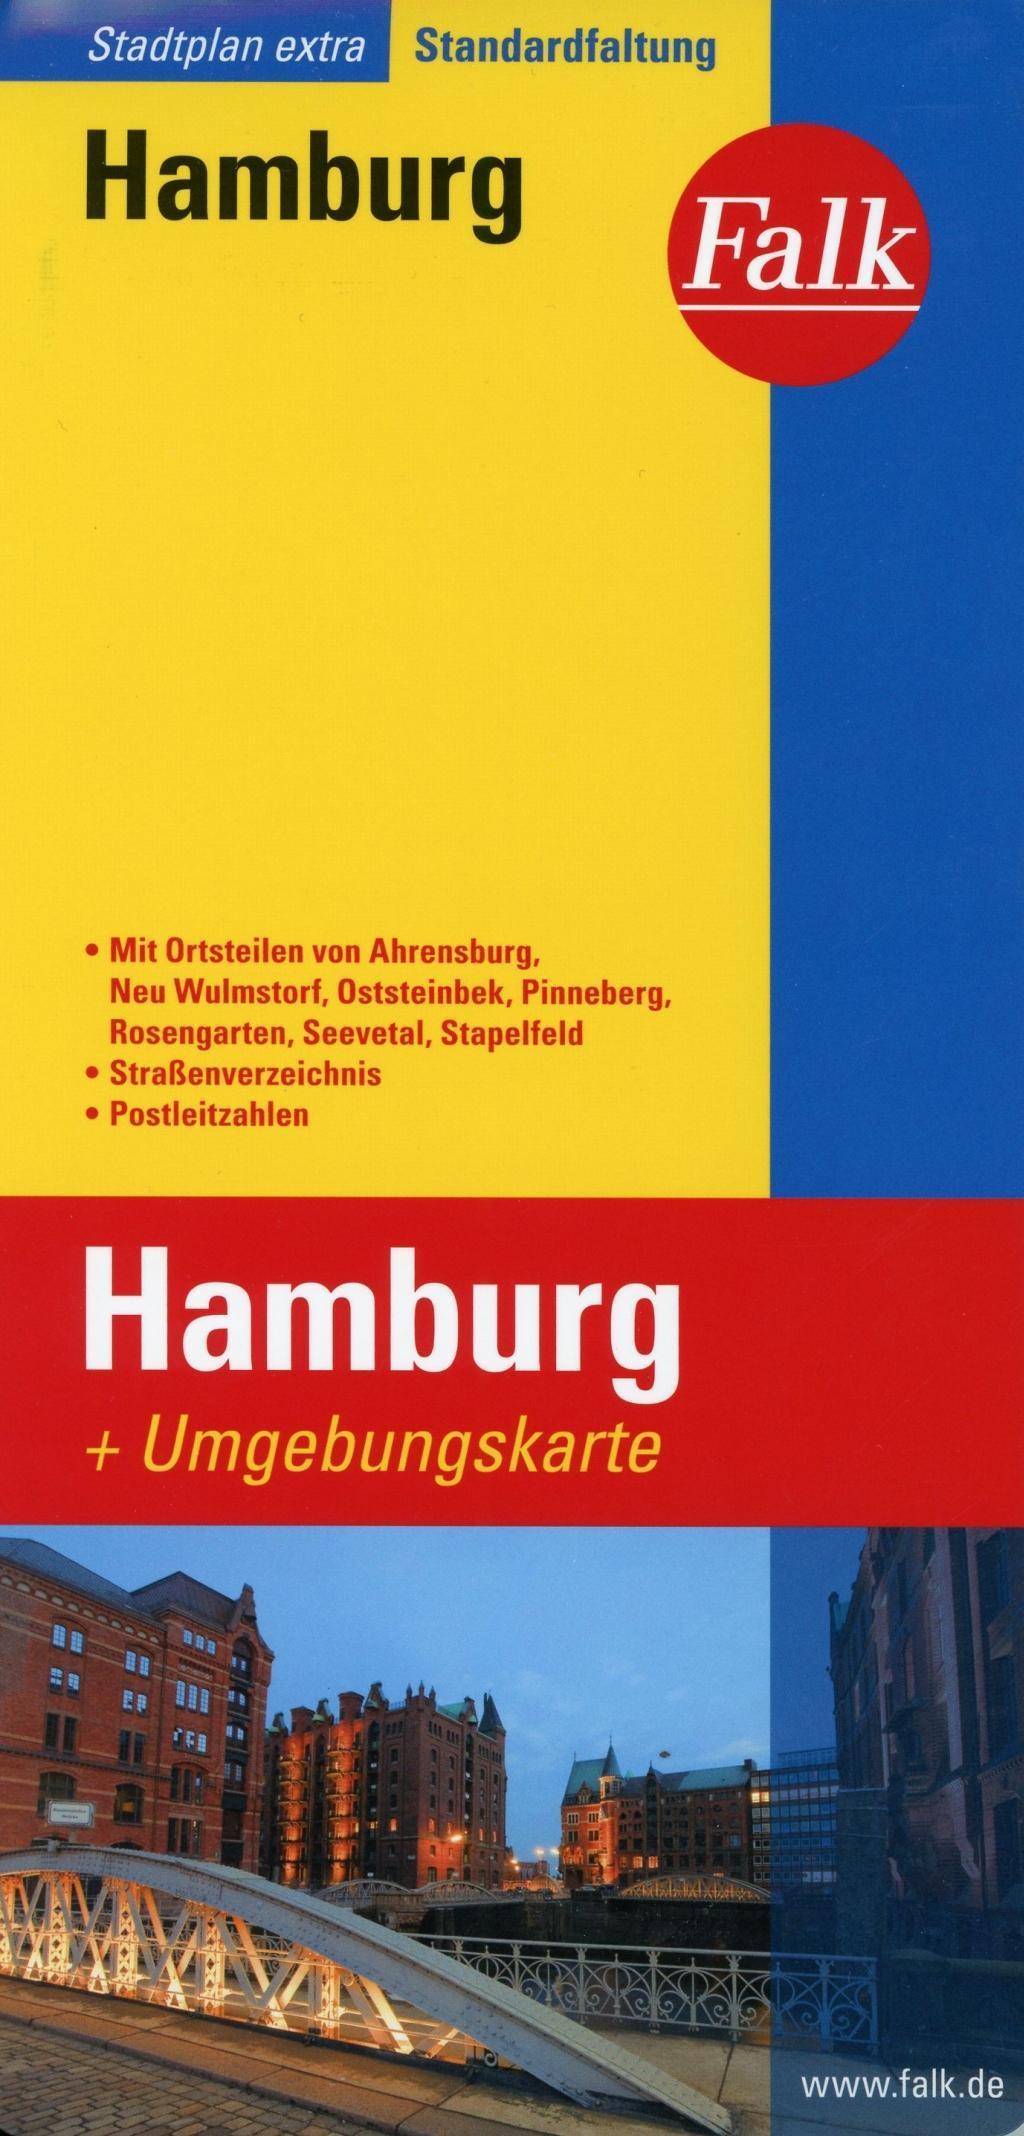 Falk Stadtplan Extra Standardfaltung Hamburg 1:22 500-1:39 000